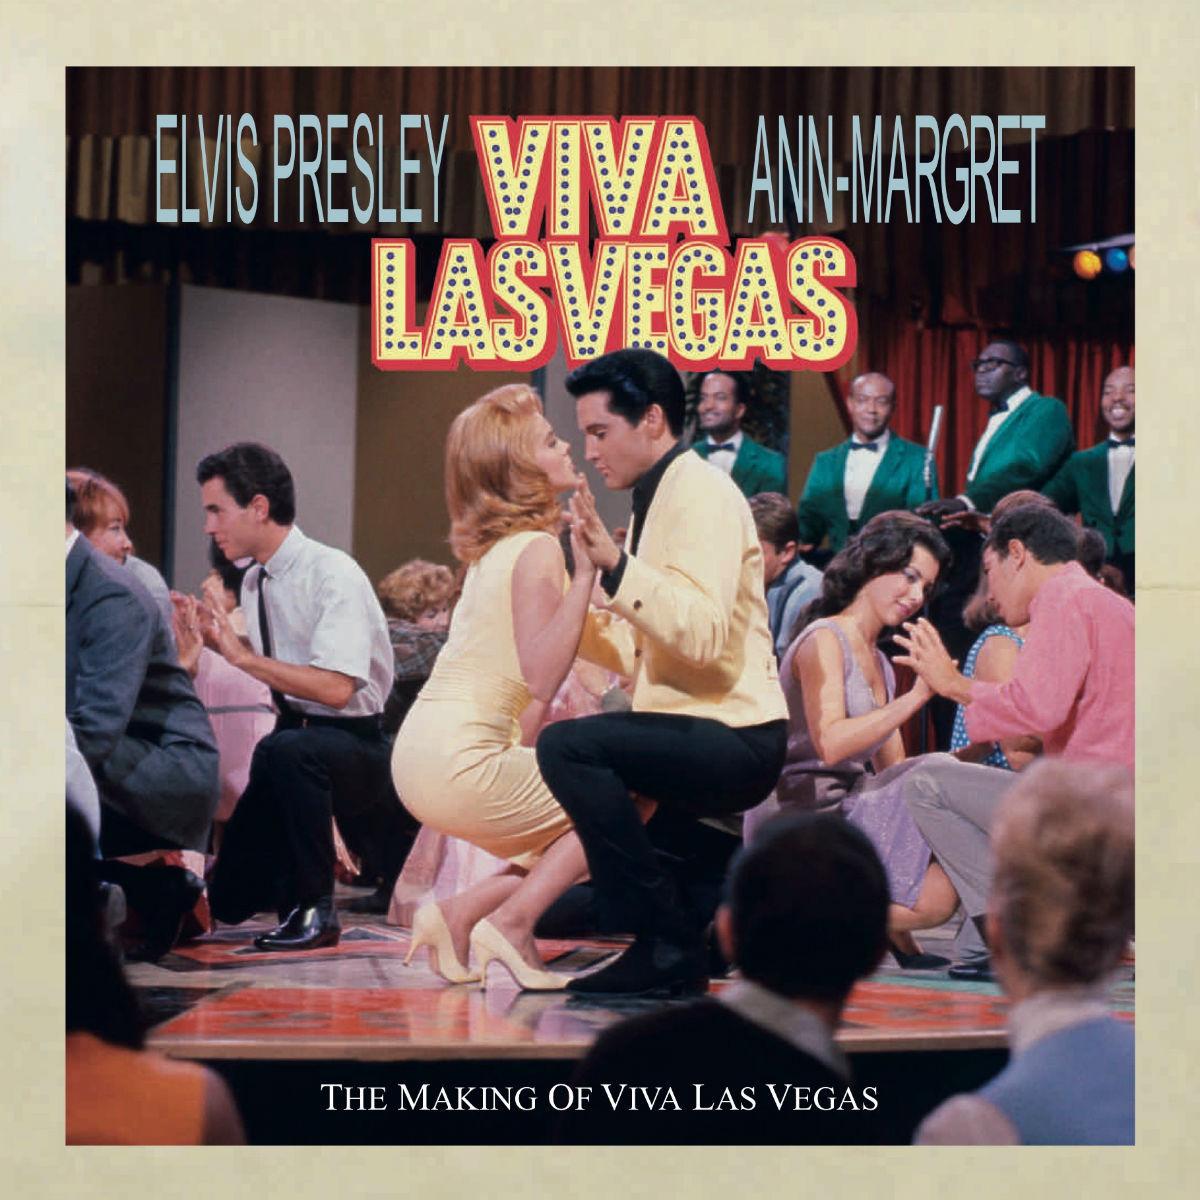 The Making of Viva Las Vegas FTD Book + CD